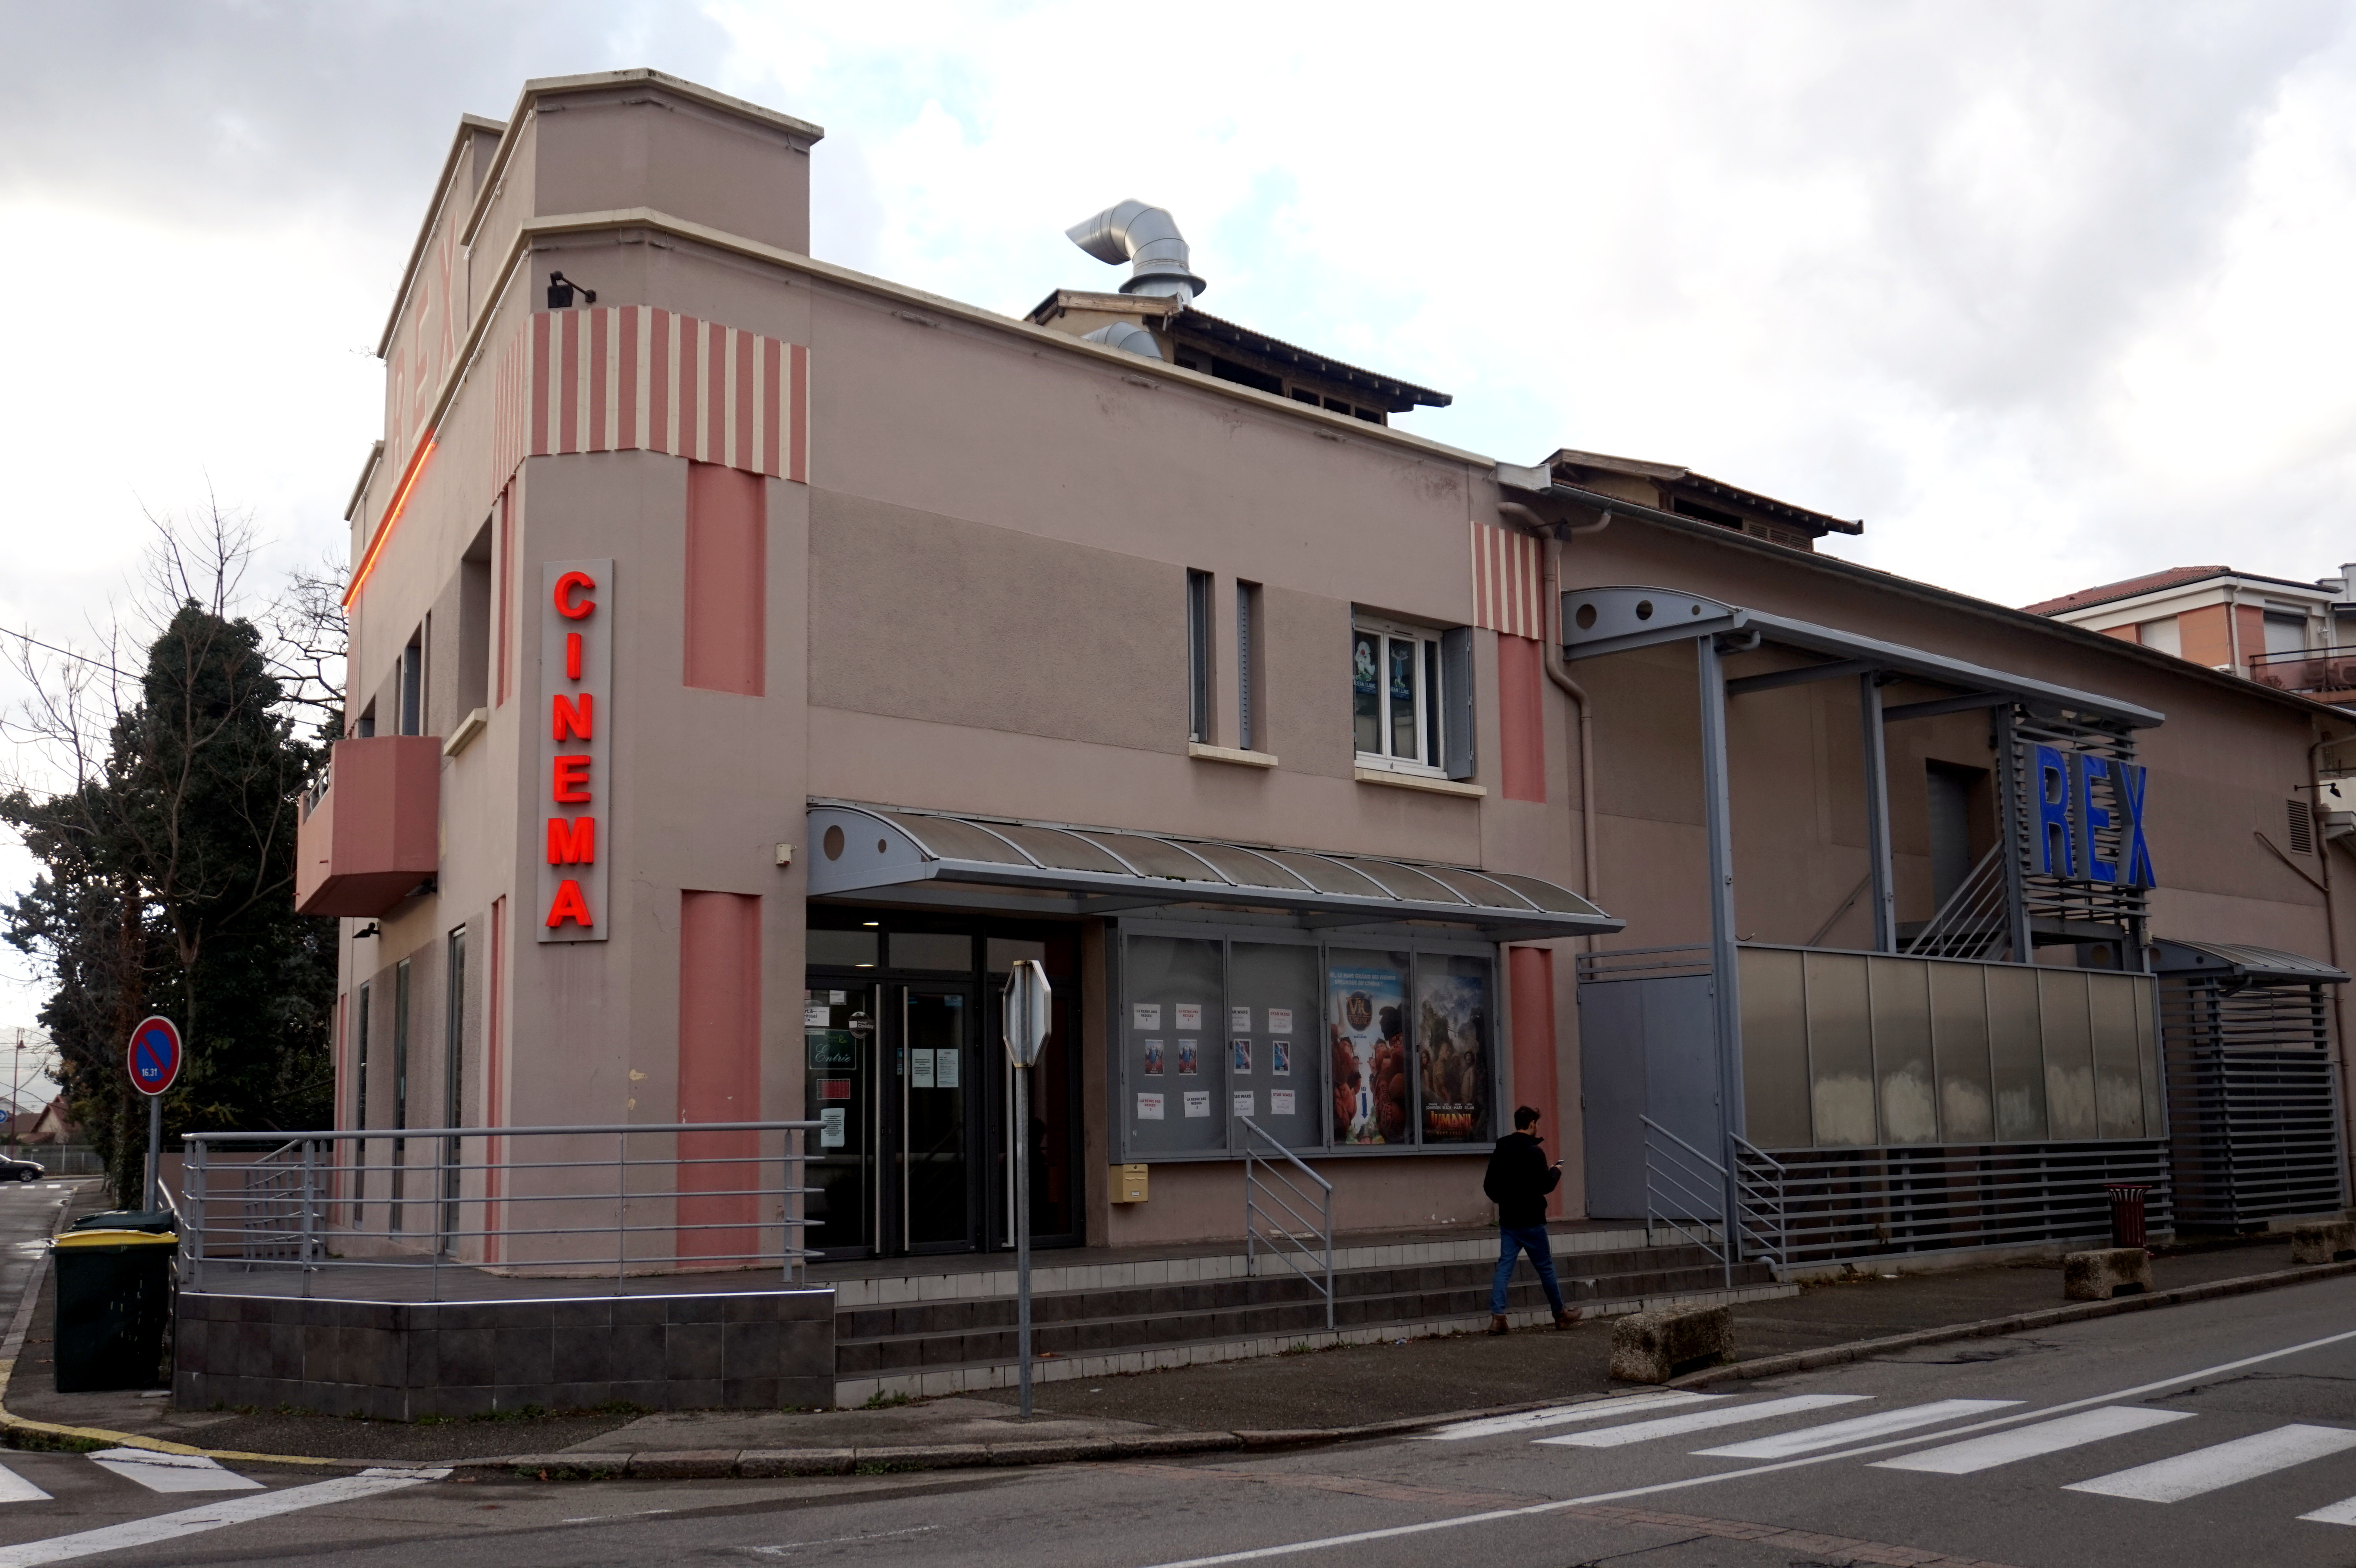 File:CinemaREX-PeageDeRoussillon-8.jpg - Wikimedia Commons